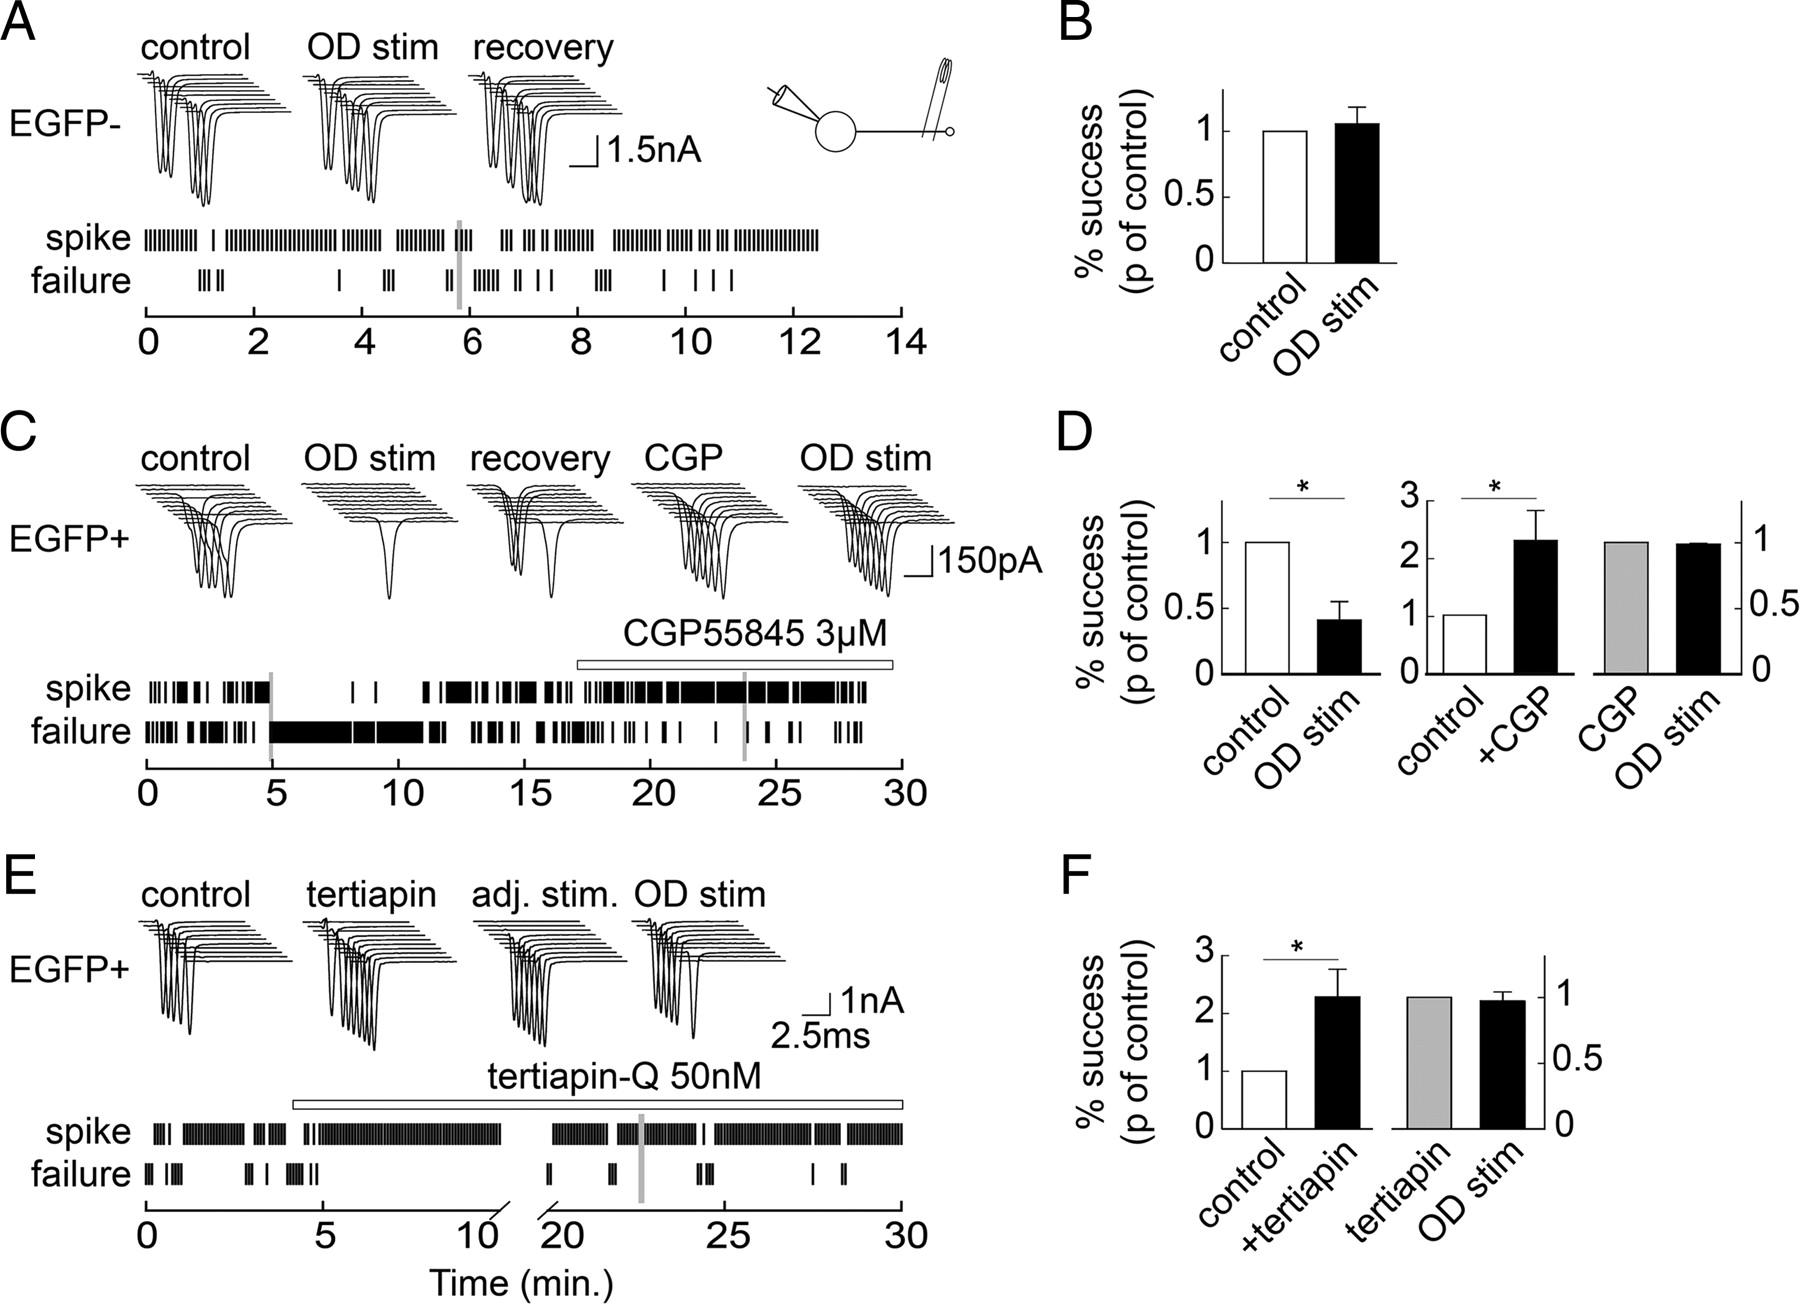 Presynaptic But Not Postsynaptic GABA Signaling At Unitary Mossy